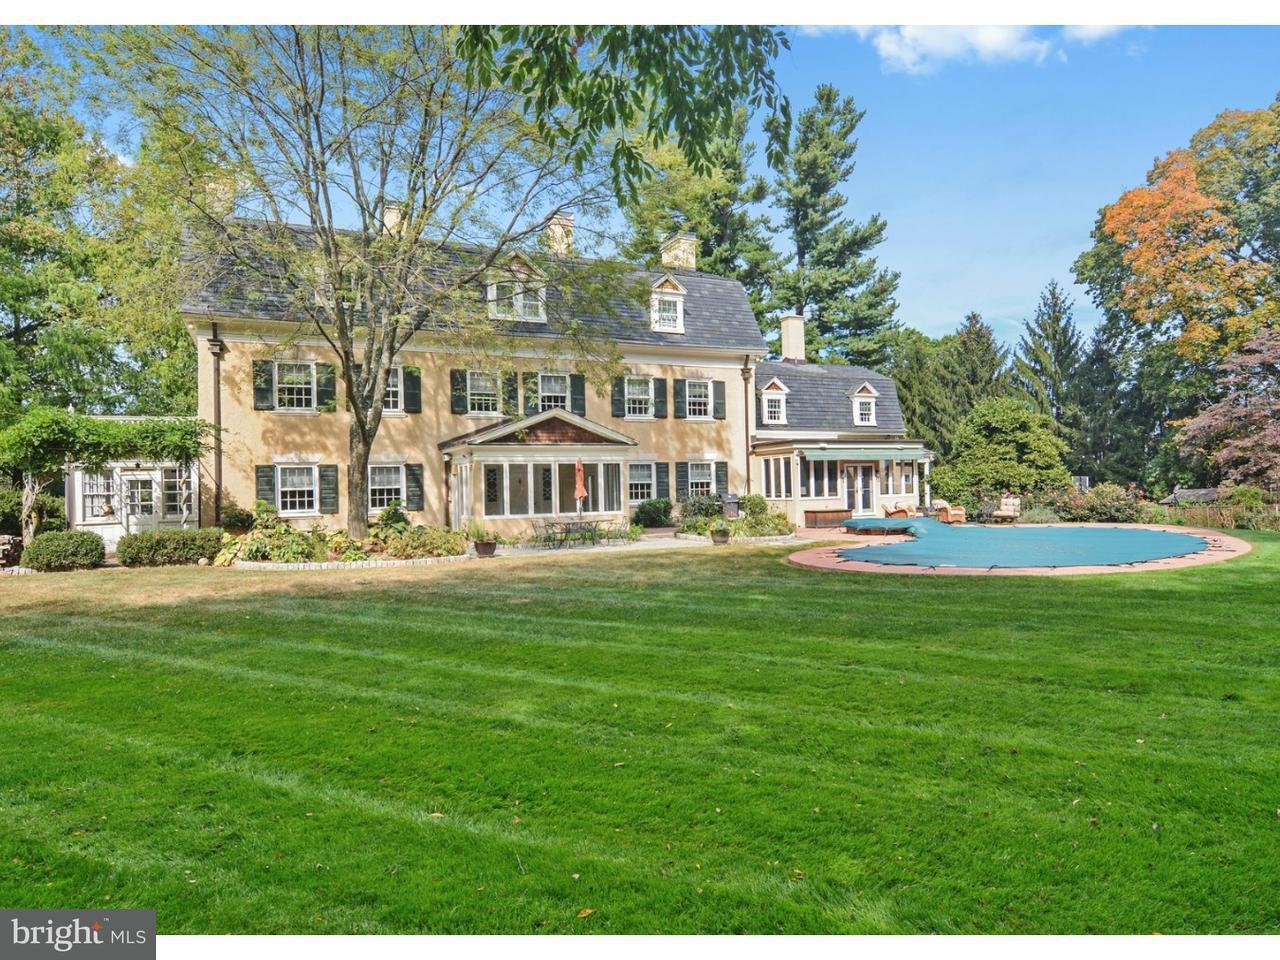 Single Family Home for Sale at 451 SAINT DAVIDS Avenue Wayne, Pennsylvania 19087 United States